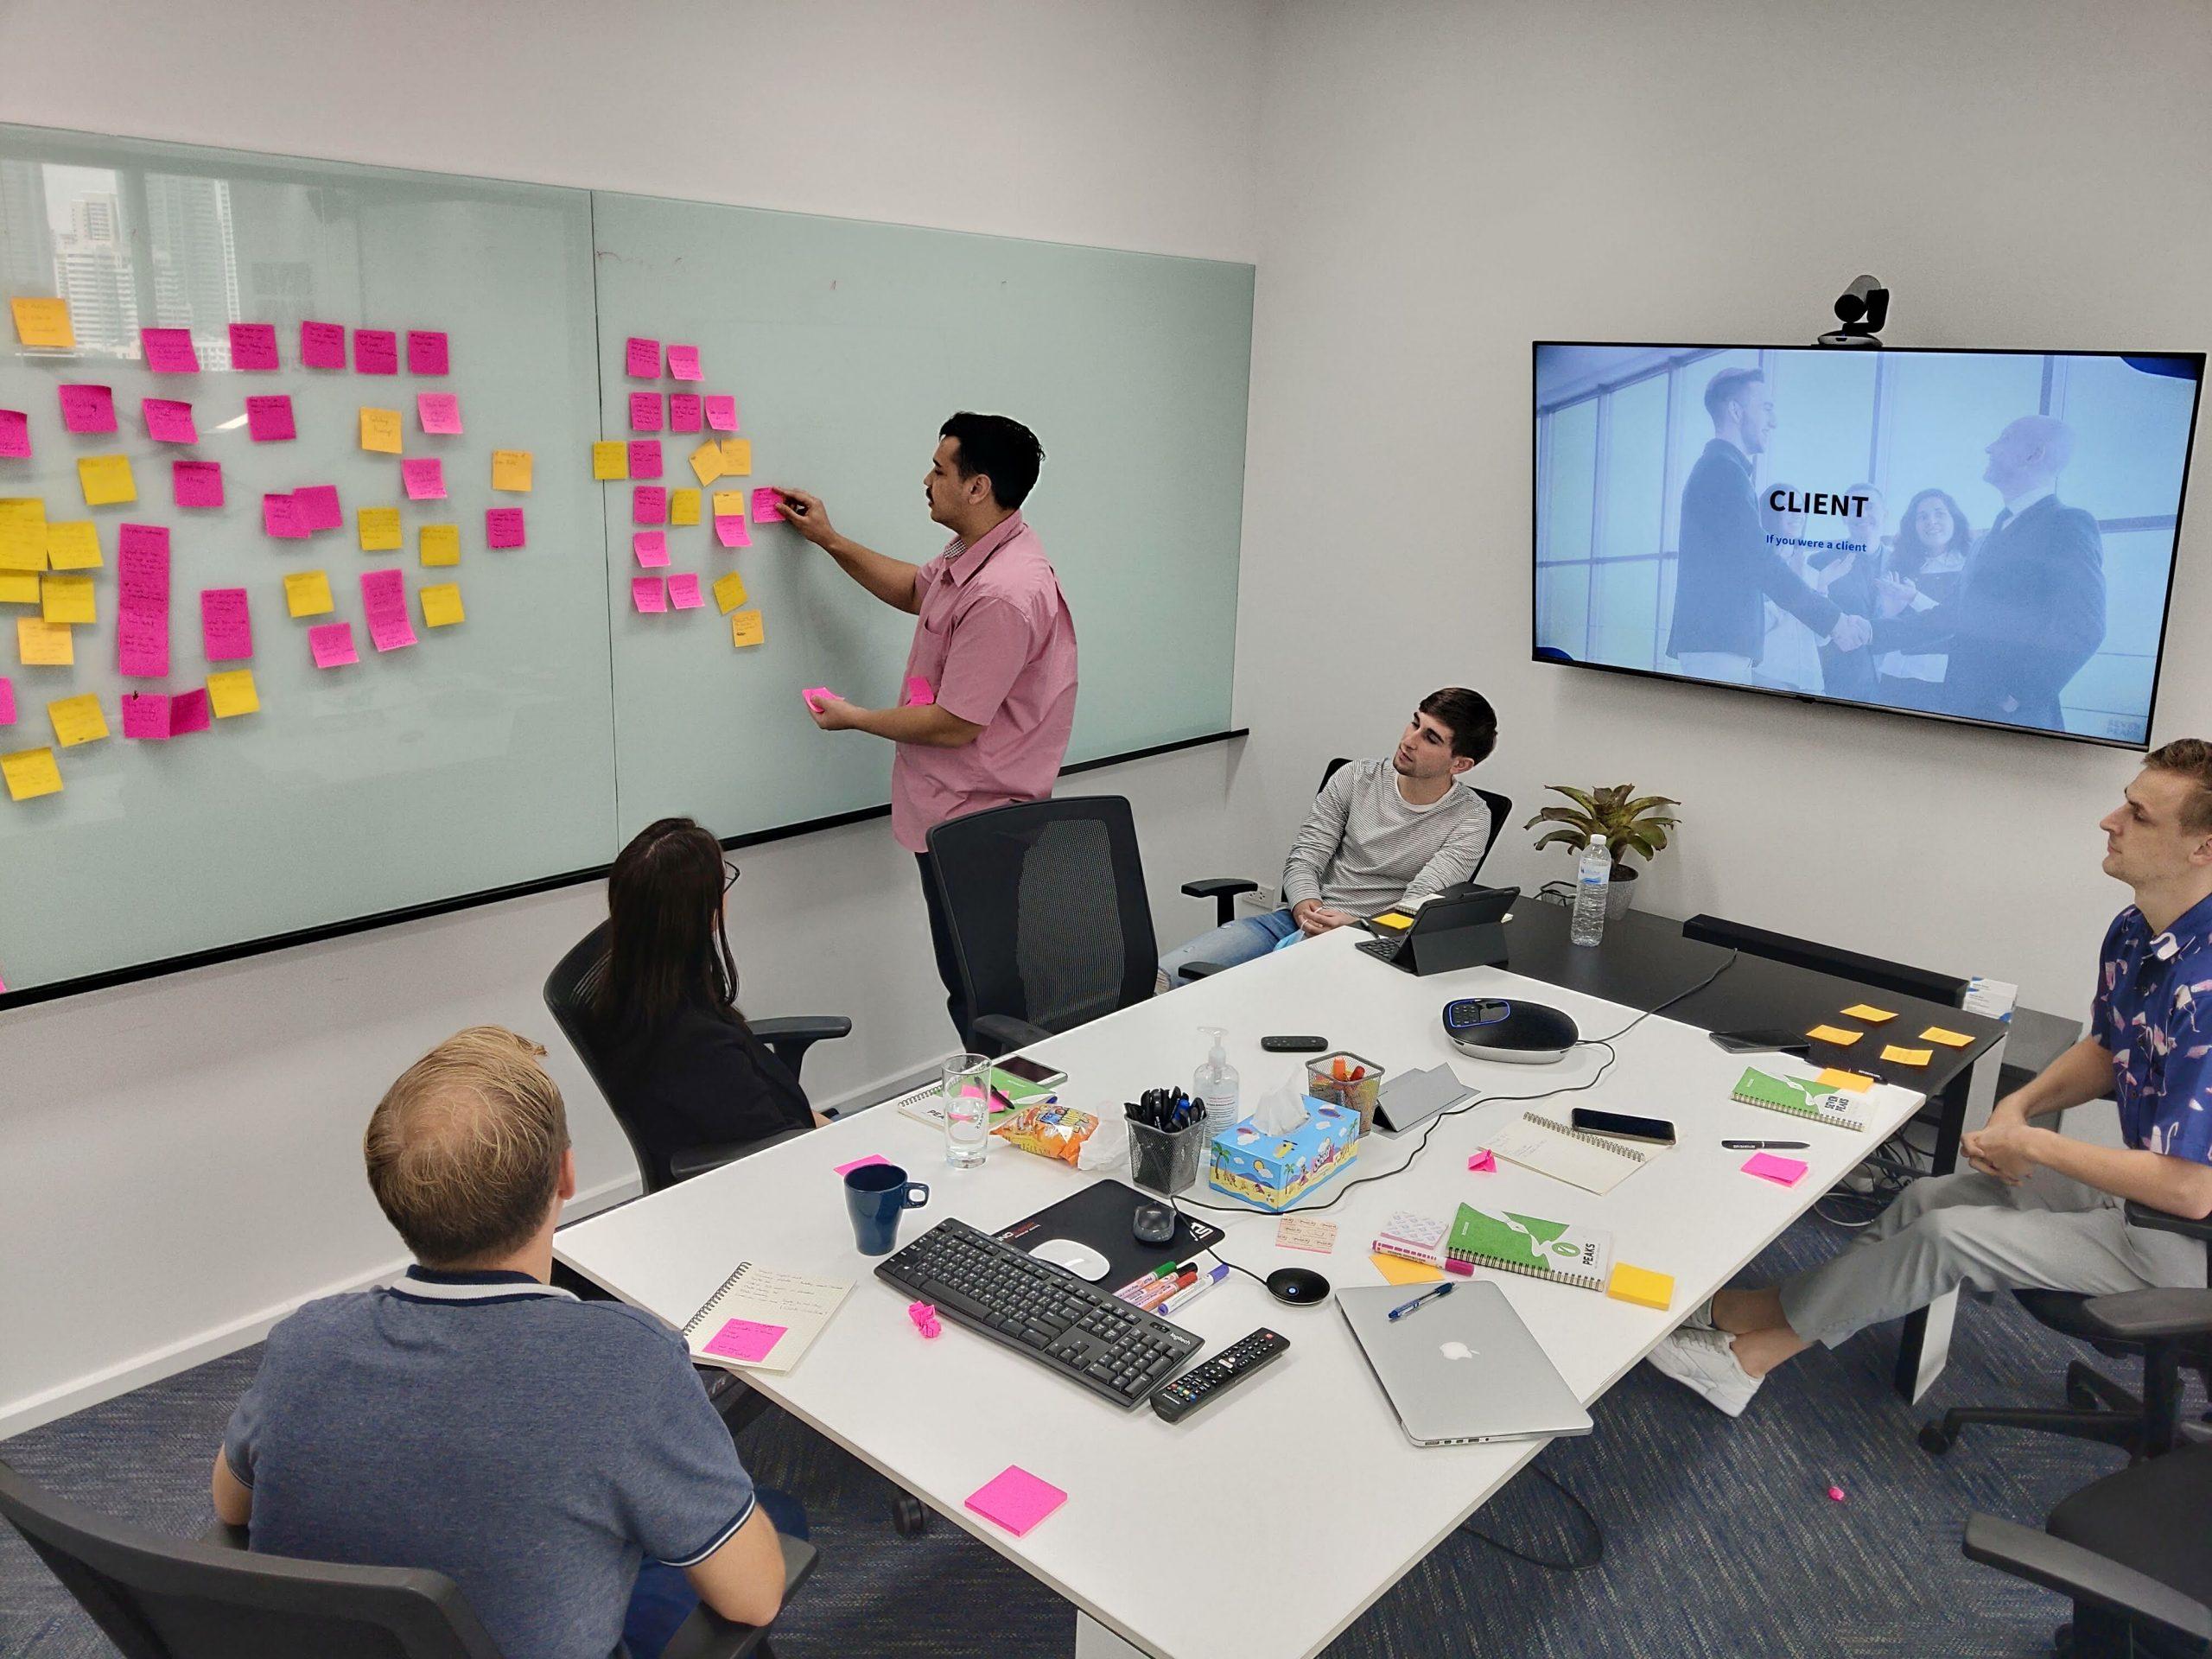 Internship Digital marketing - Brainstorming with the marketing team